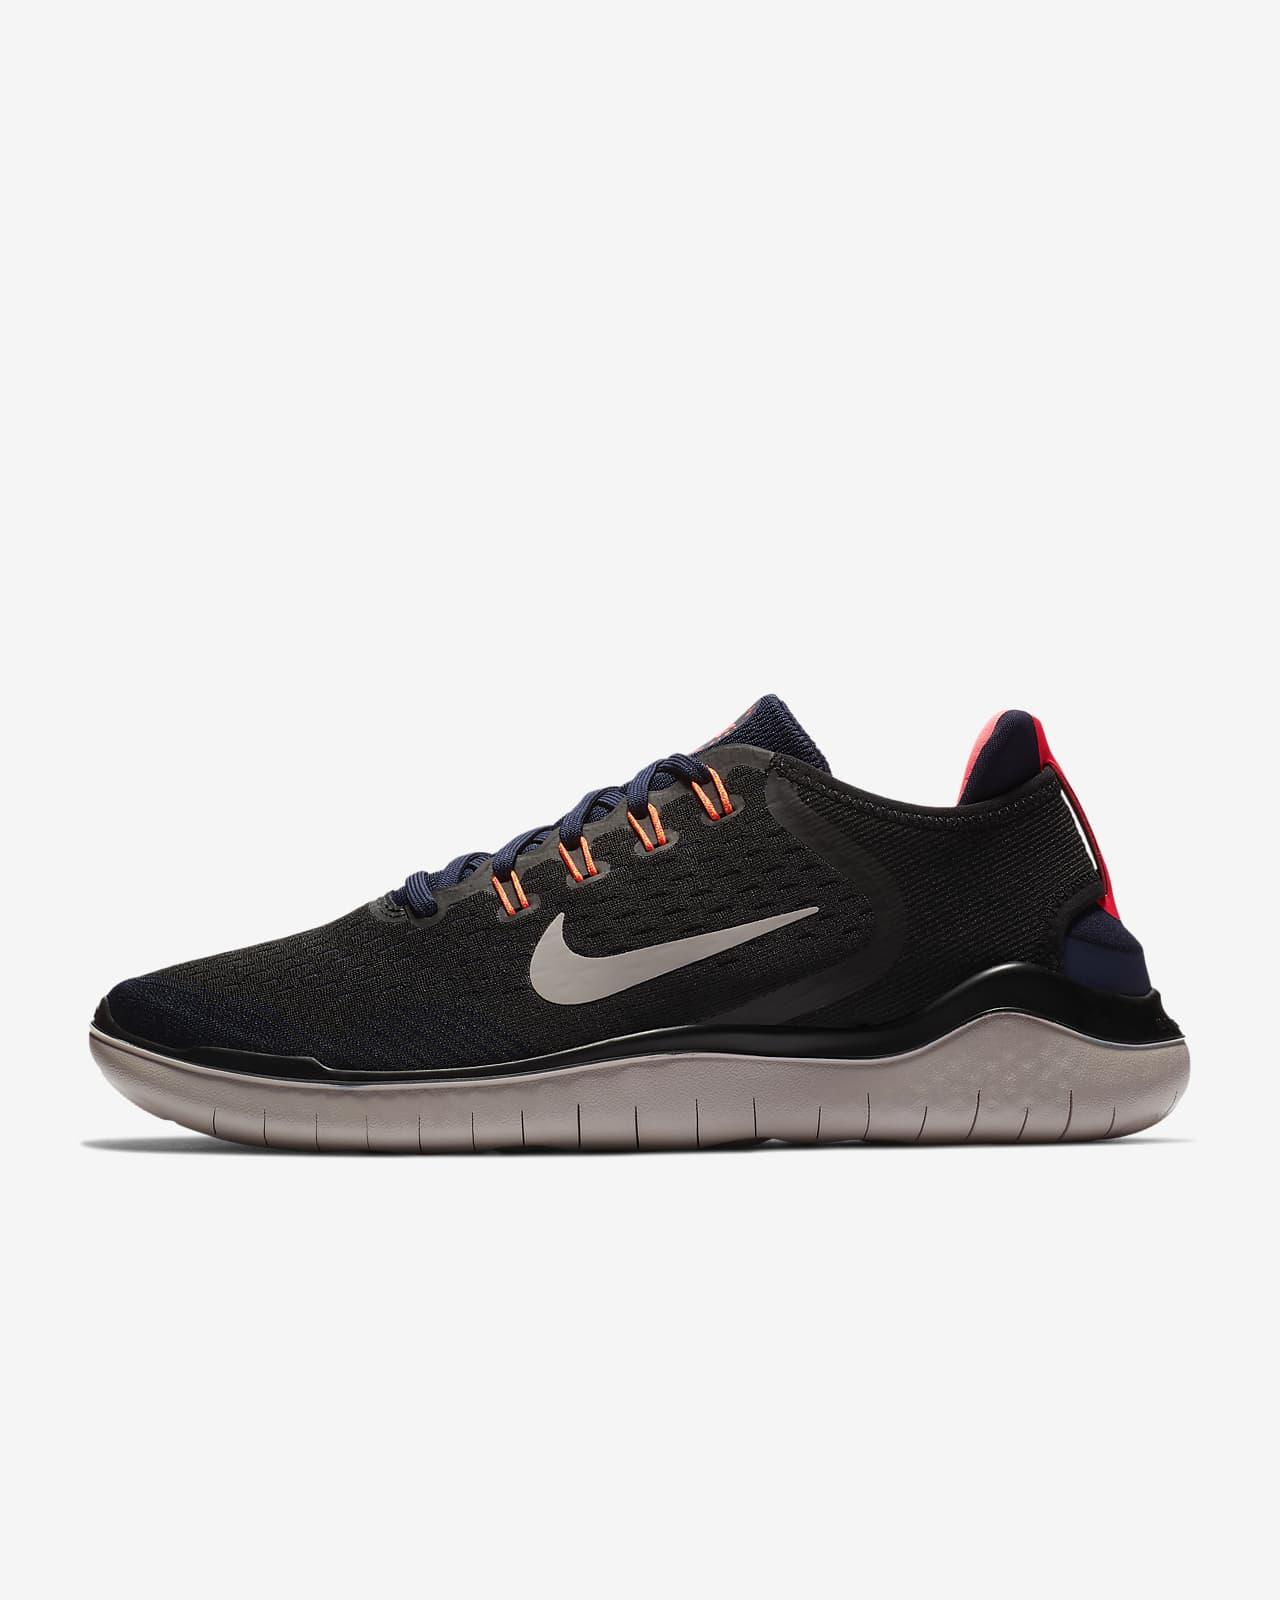 Limited Time Deals Nike Air Max 2018 Hombre Off 74 Nalan Com Sg